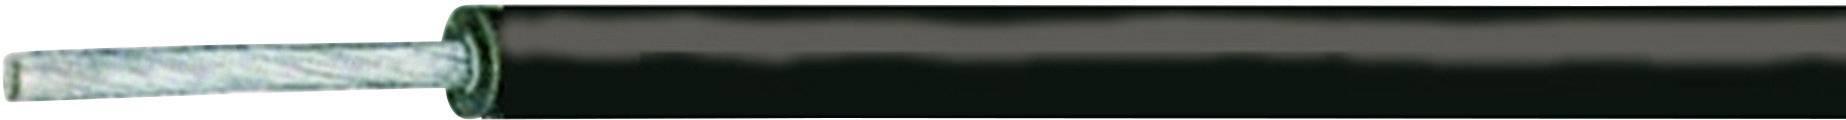 Stikalna žica SiL-SiAF 1 x 4 mm, rdeča XBK Kabel cena za meter